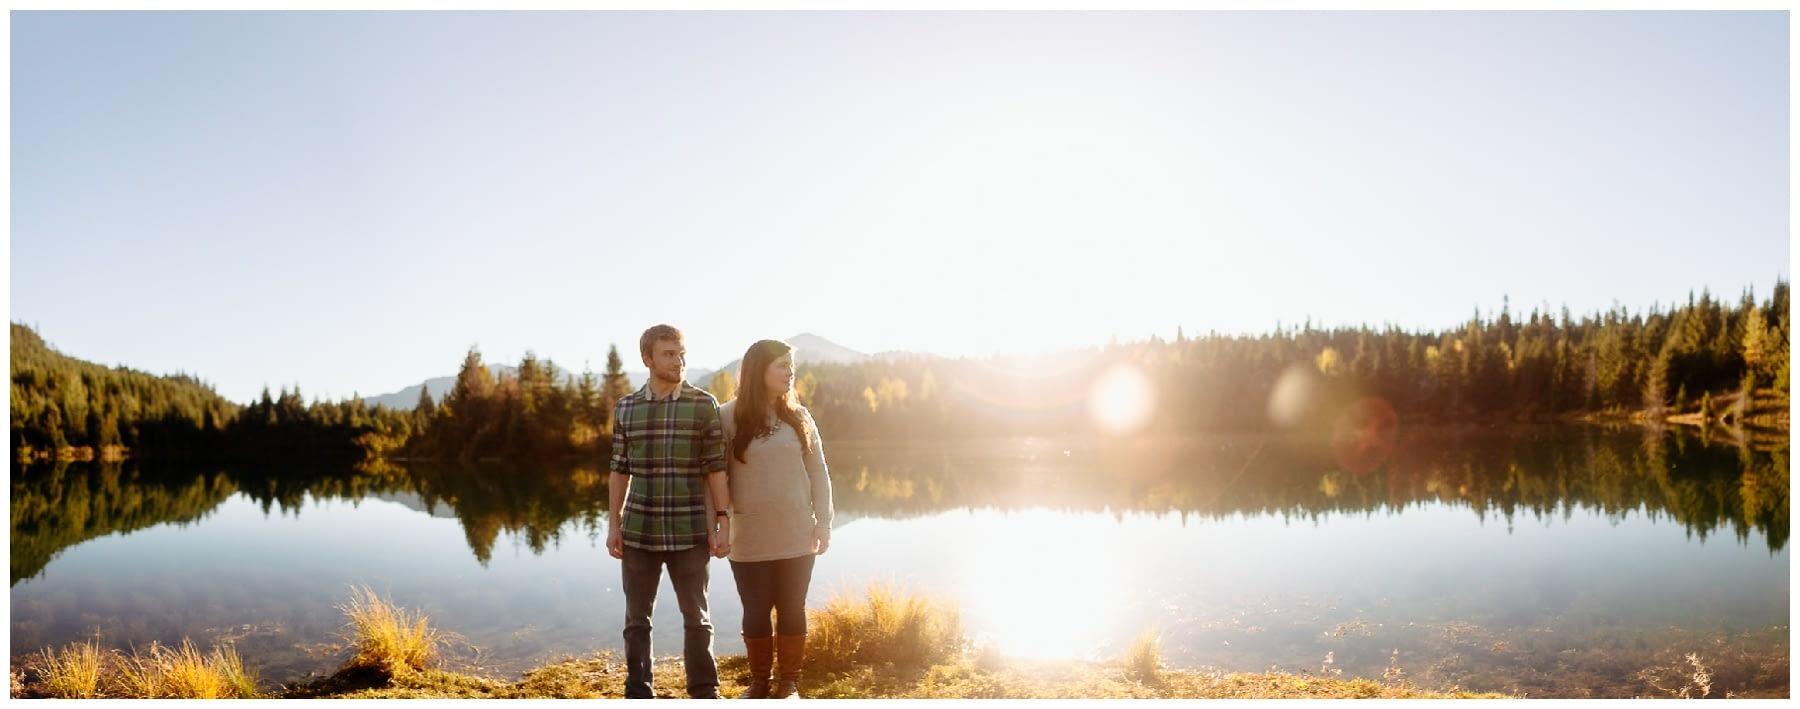 Gold Creek pond best hiking proposal in wa